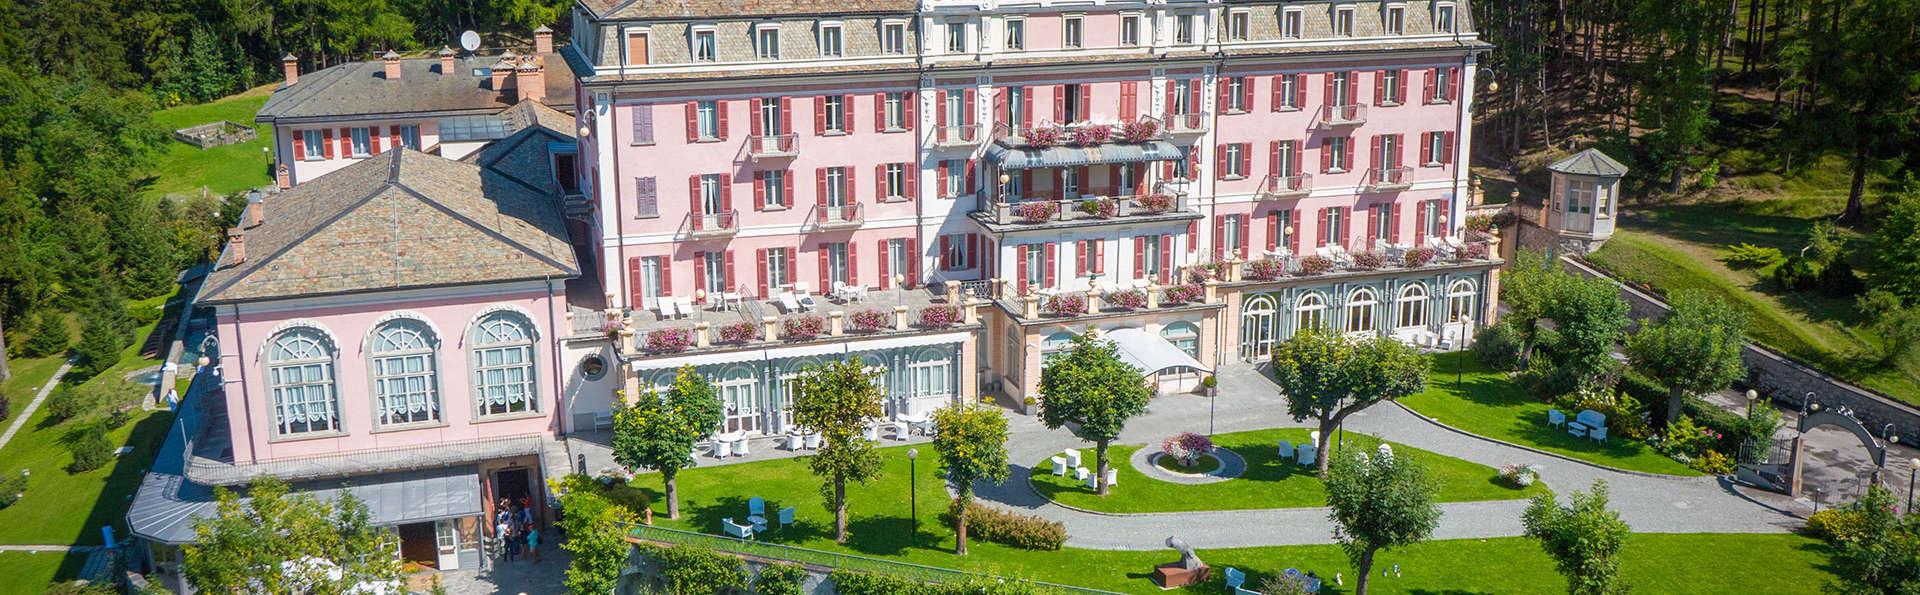 qc terme grand hotel bagni nuovi 5* - valdidentro, italia